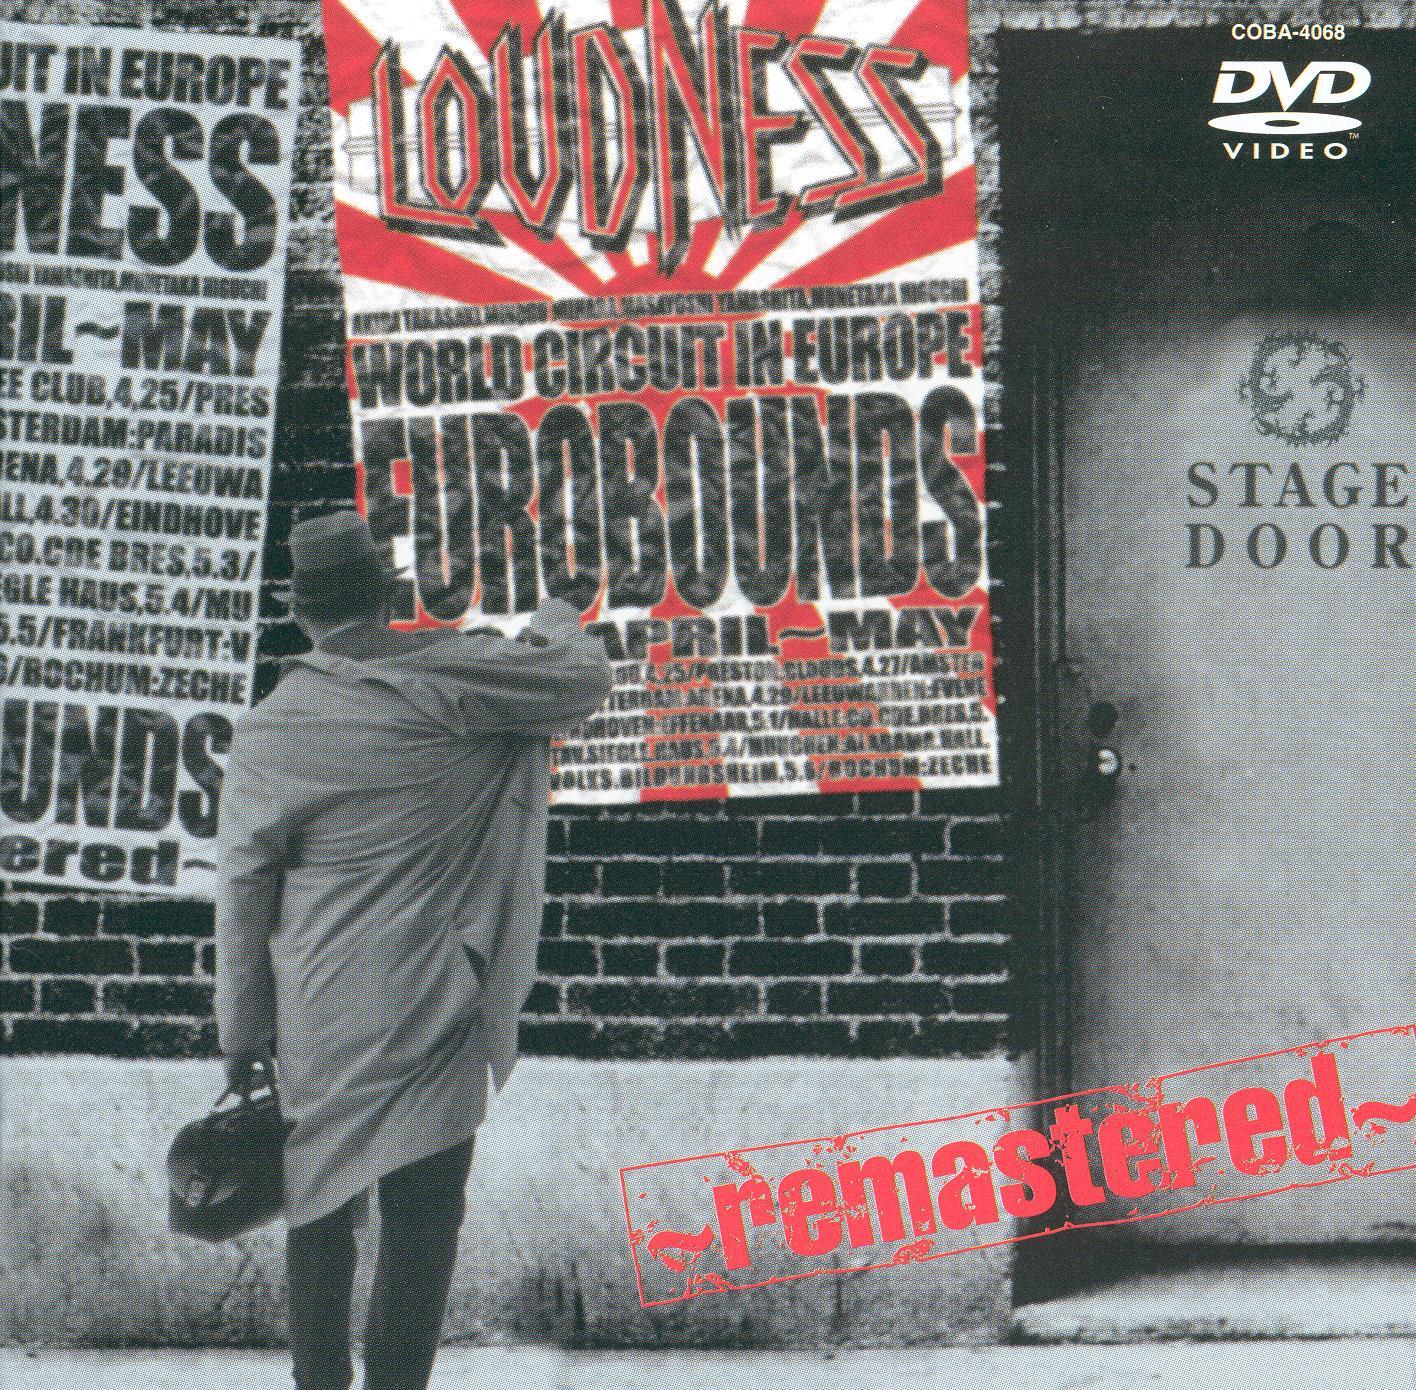 Loudness: Eurobunds